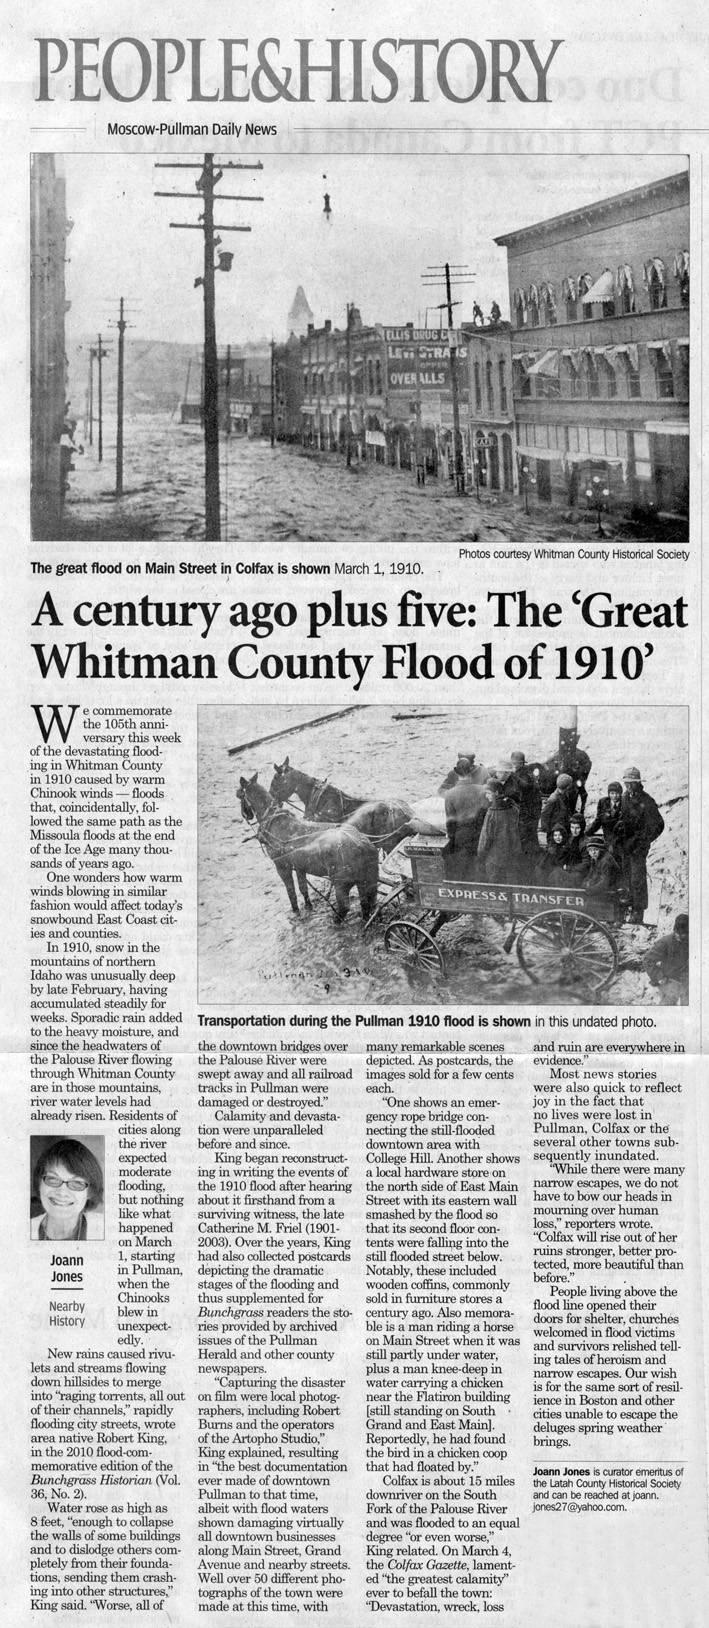 A century ago plus five: the